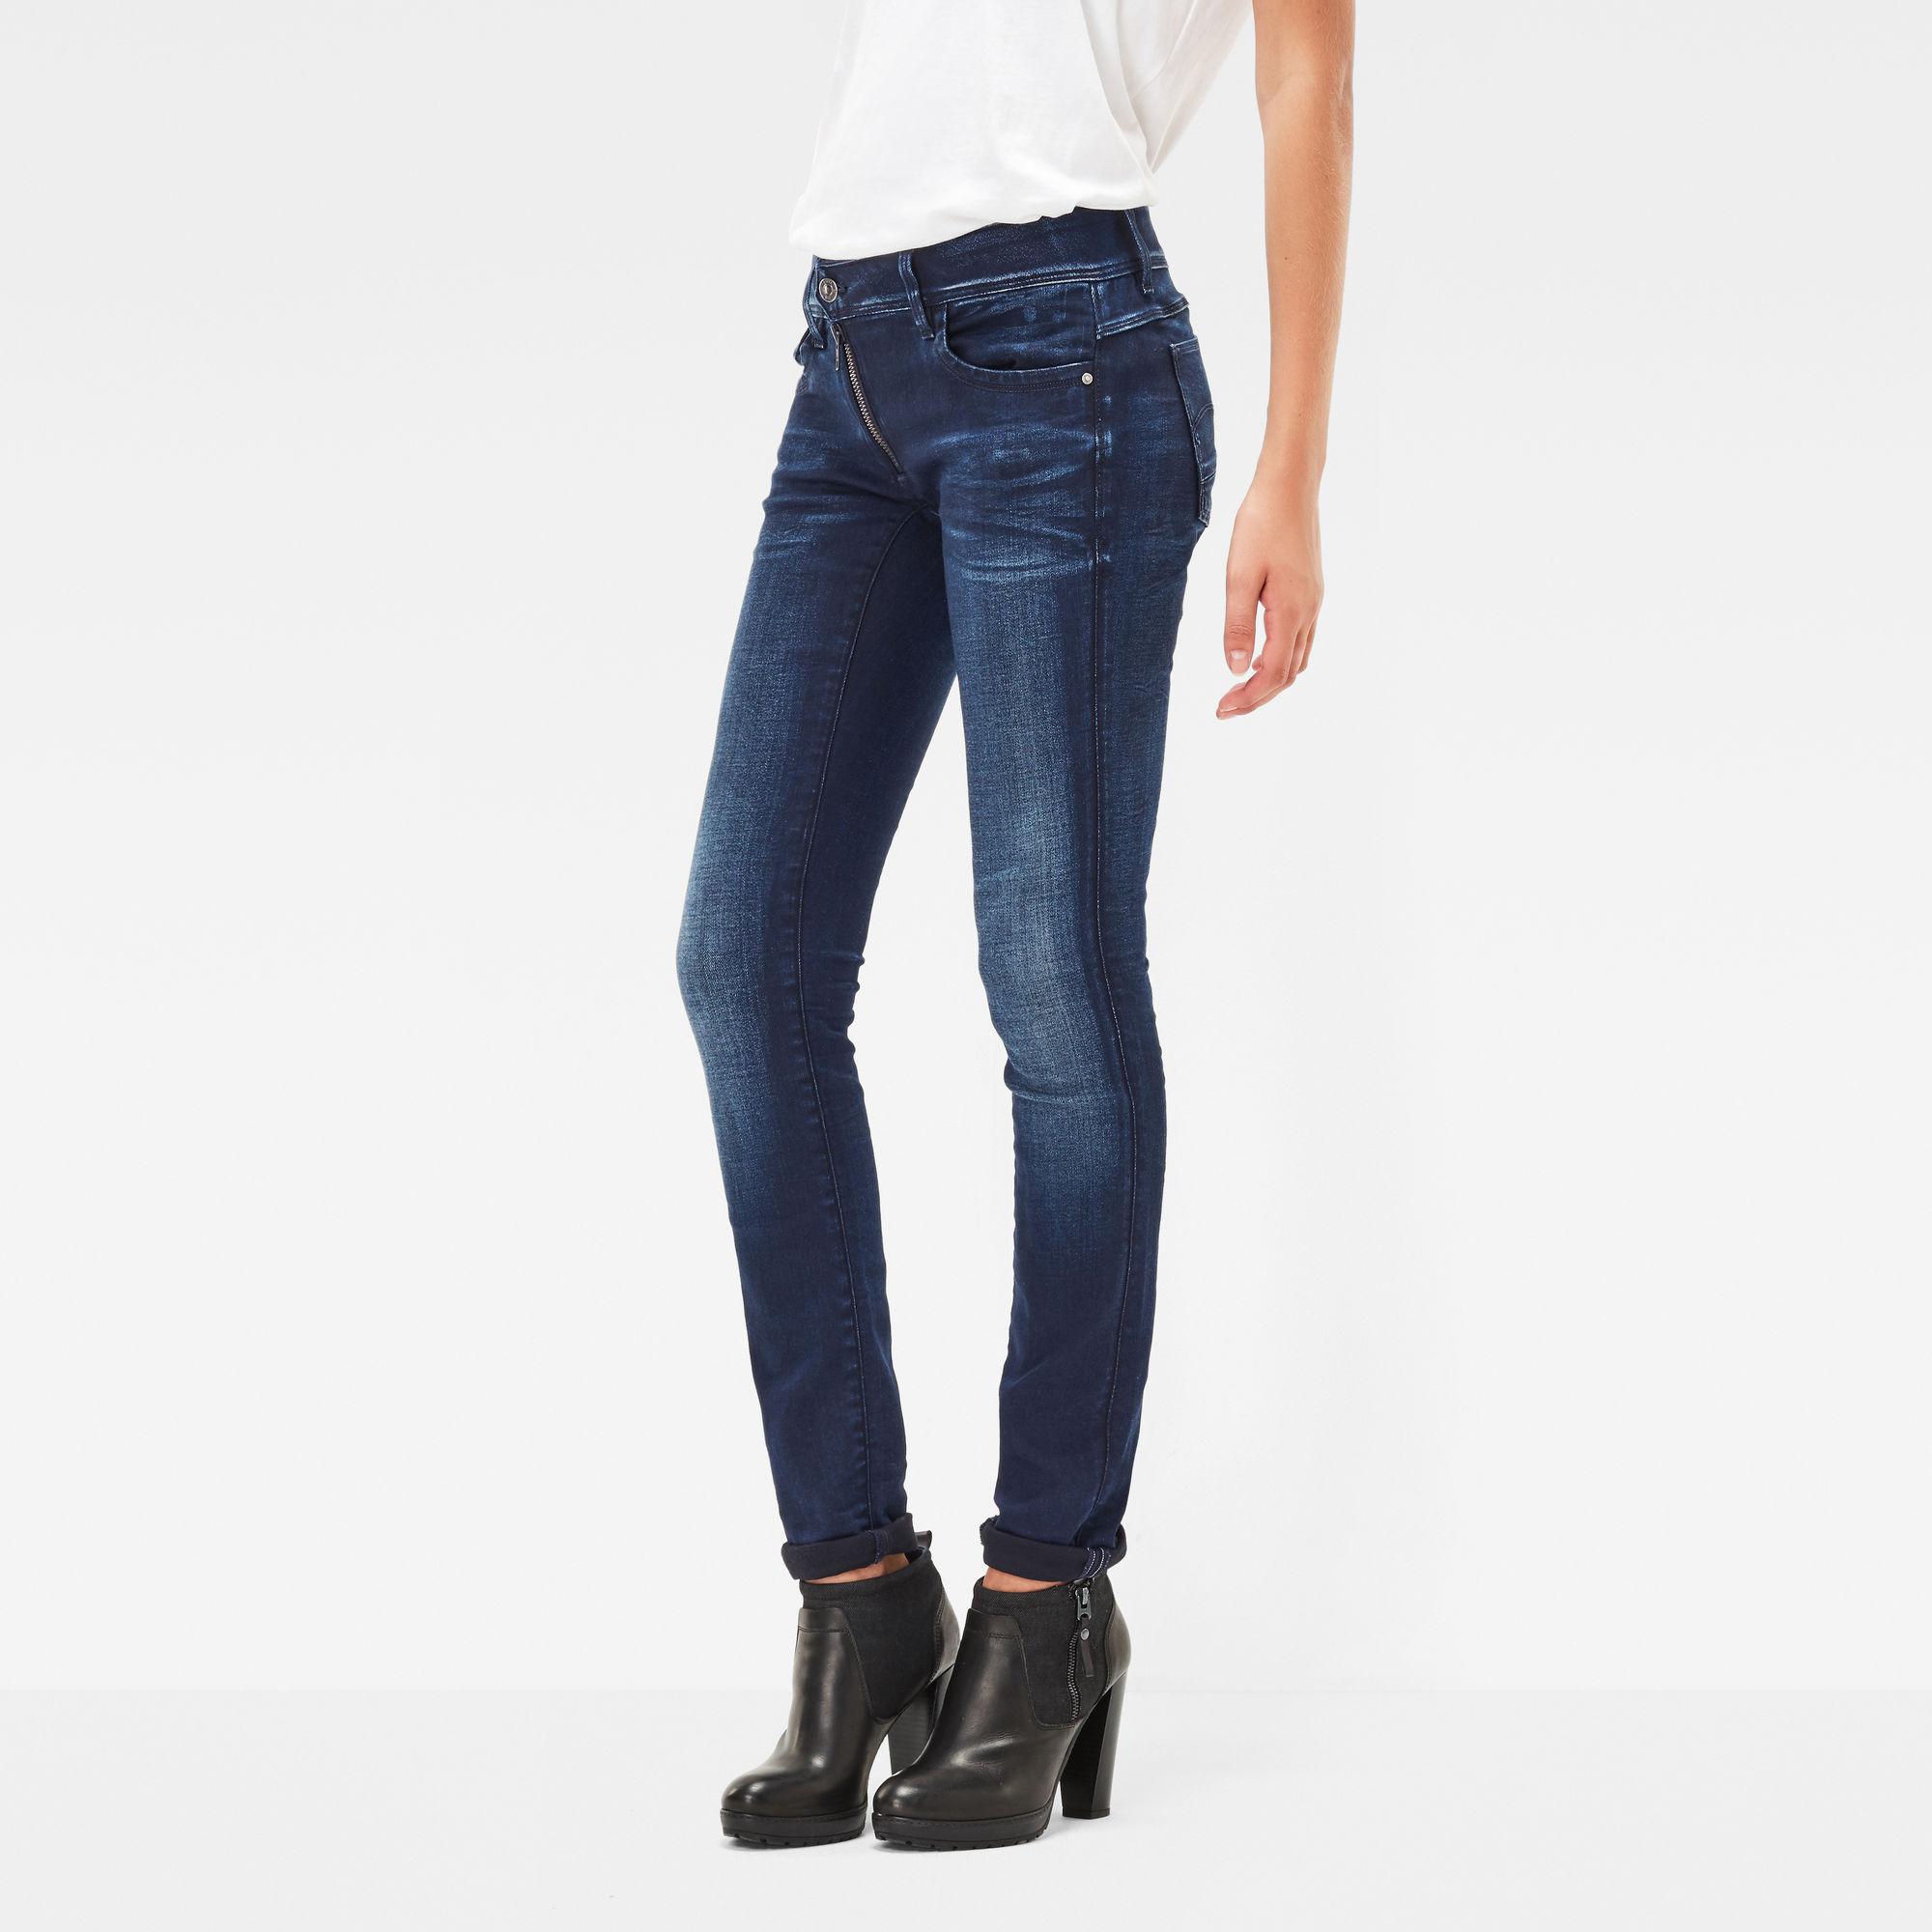 Van G Star Raw Lynn Zip Mid Waist Skinny Jeans Prijsvergelijk nu!